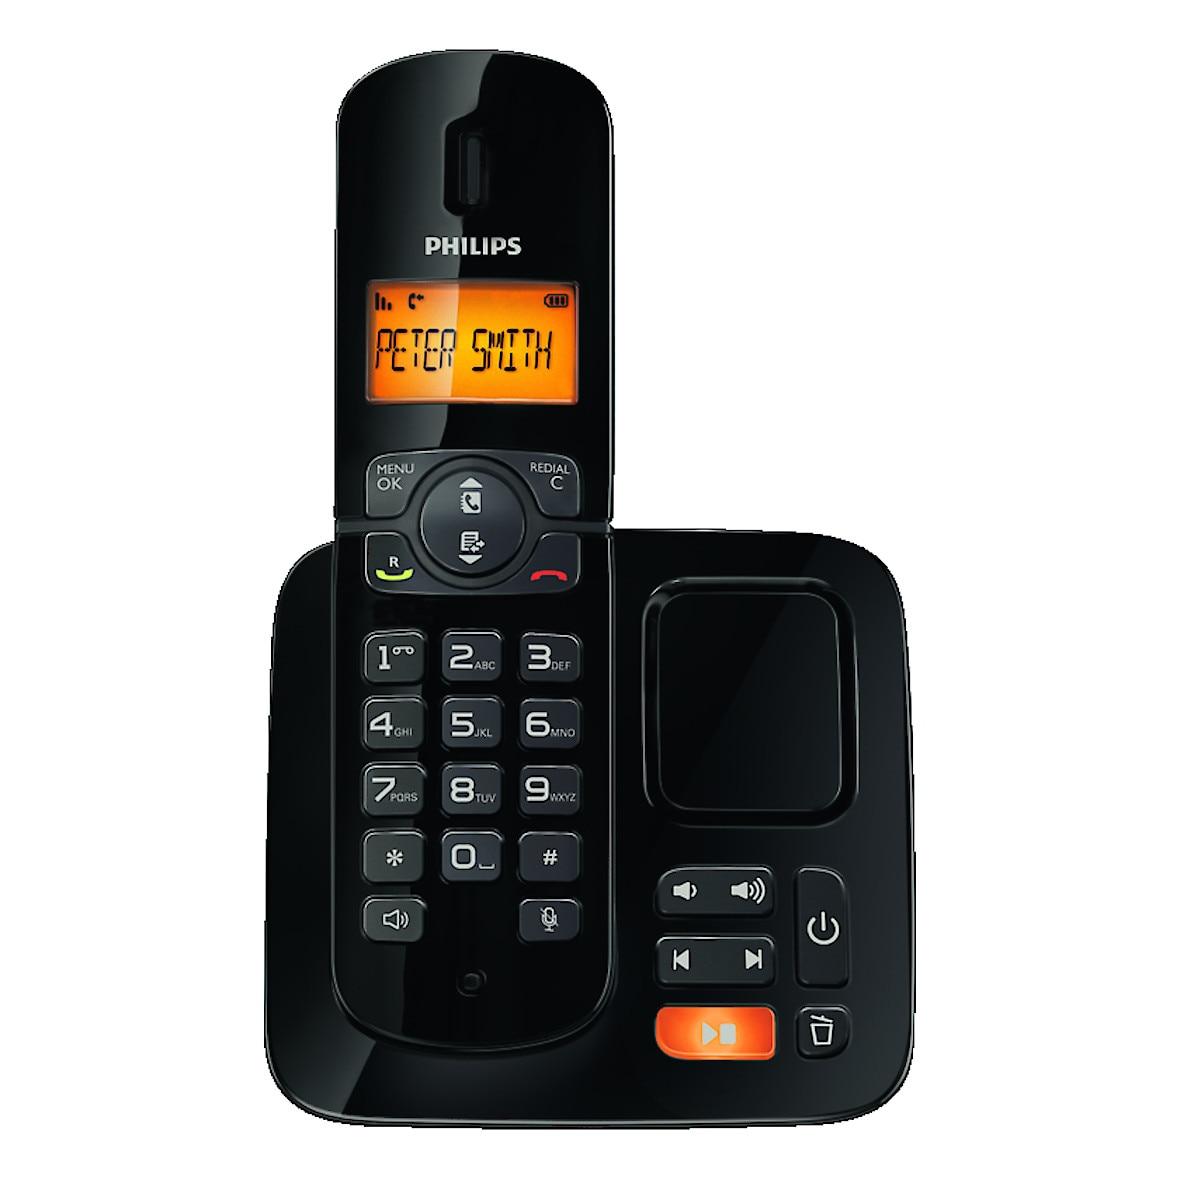 Philips CD1861 Cordless Telephone